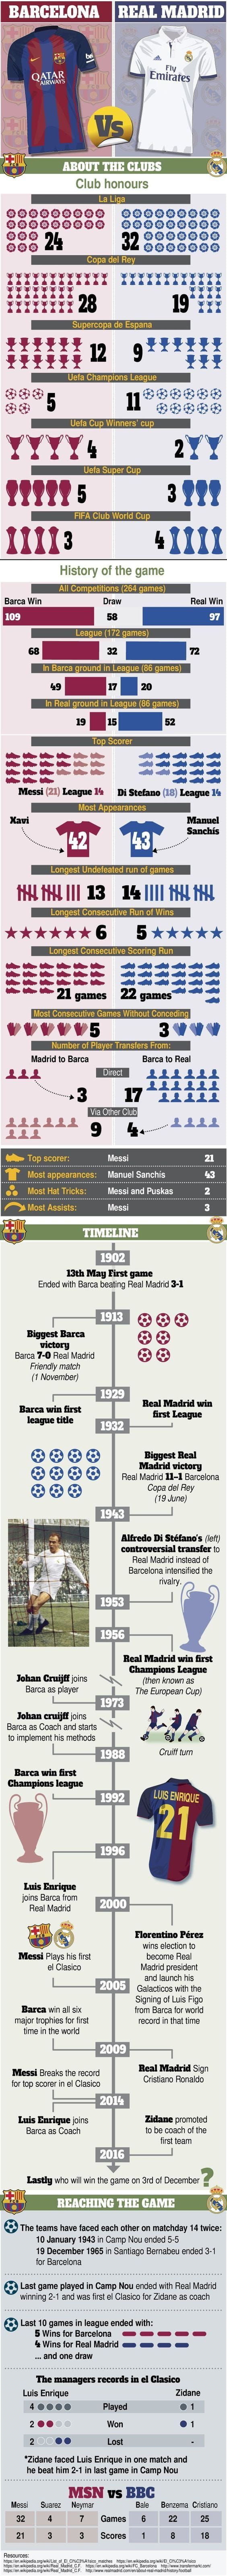 Living And Teaching English In Spain Habits Customs Ittt Barcelona Vs Real Madrid Real Madrid Madrid